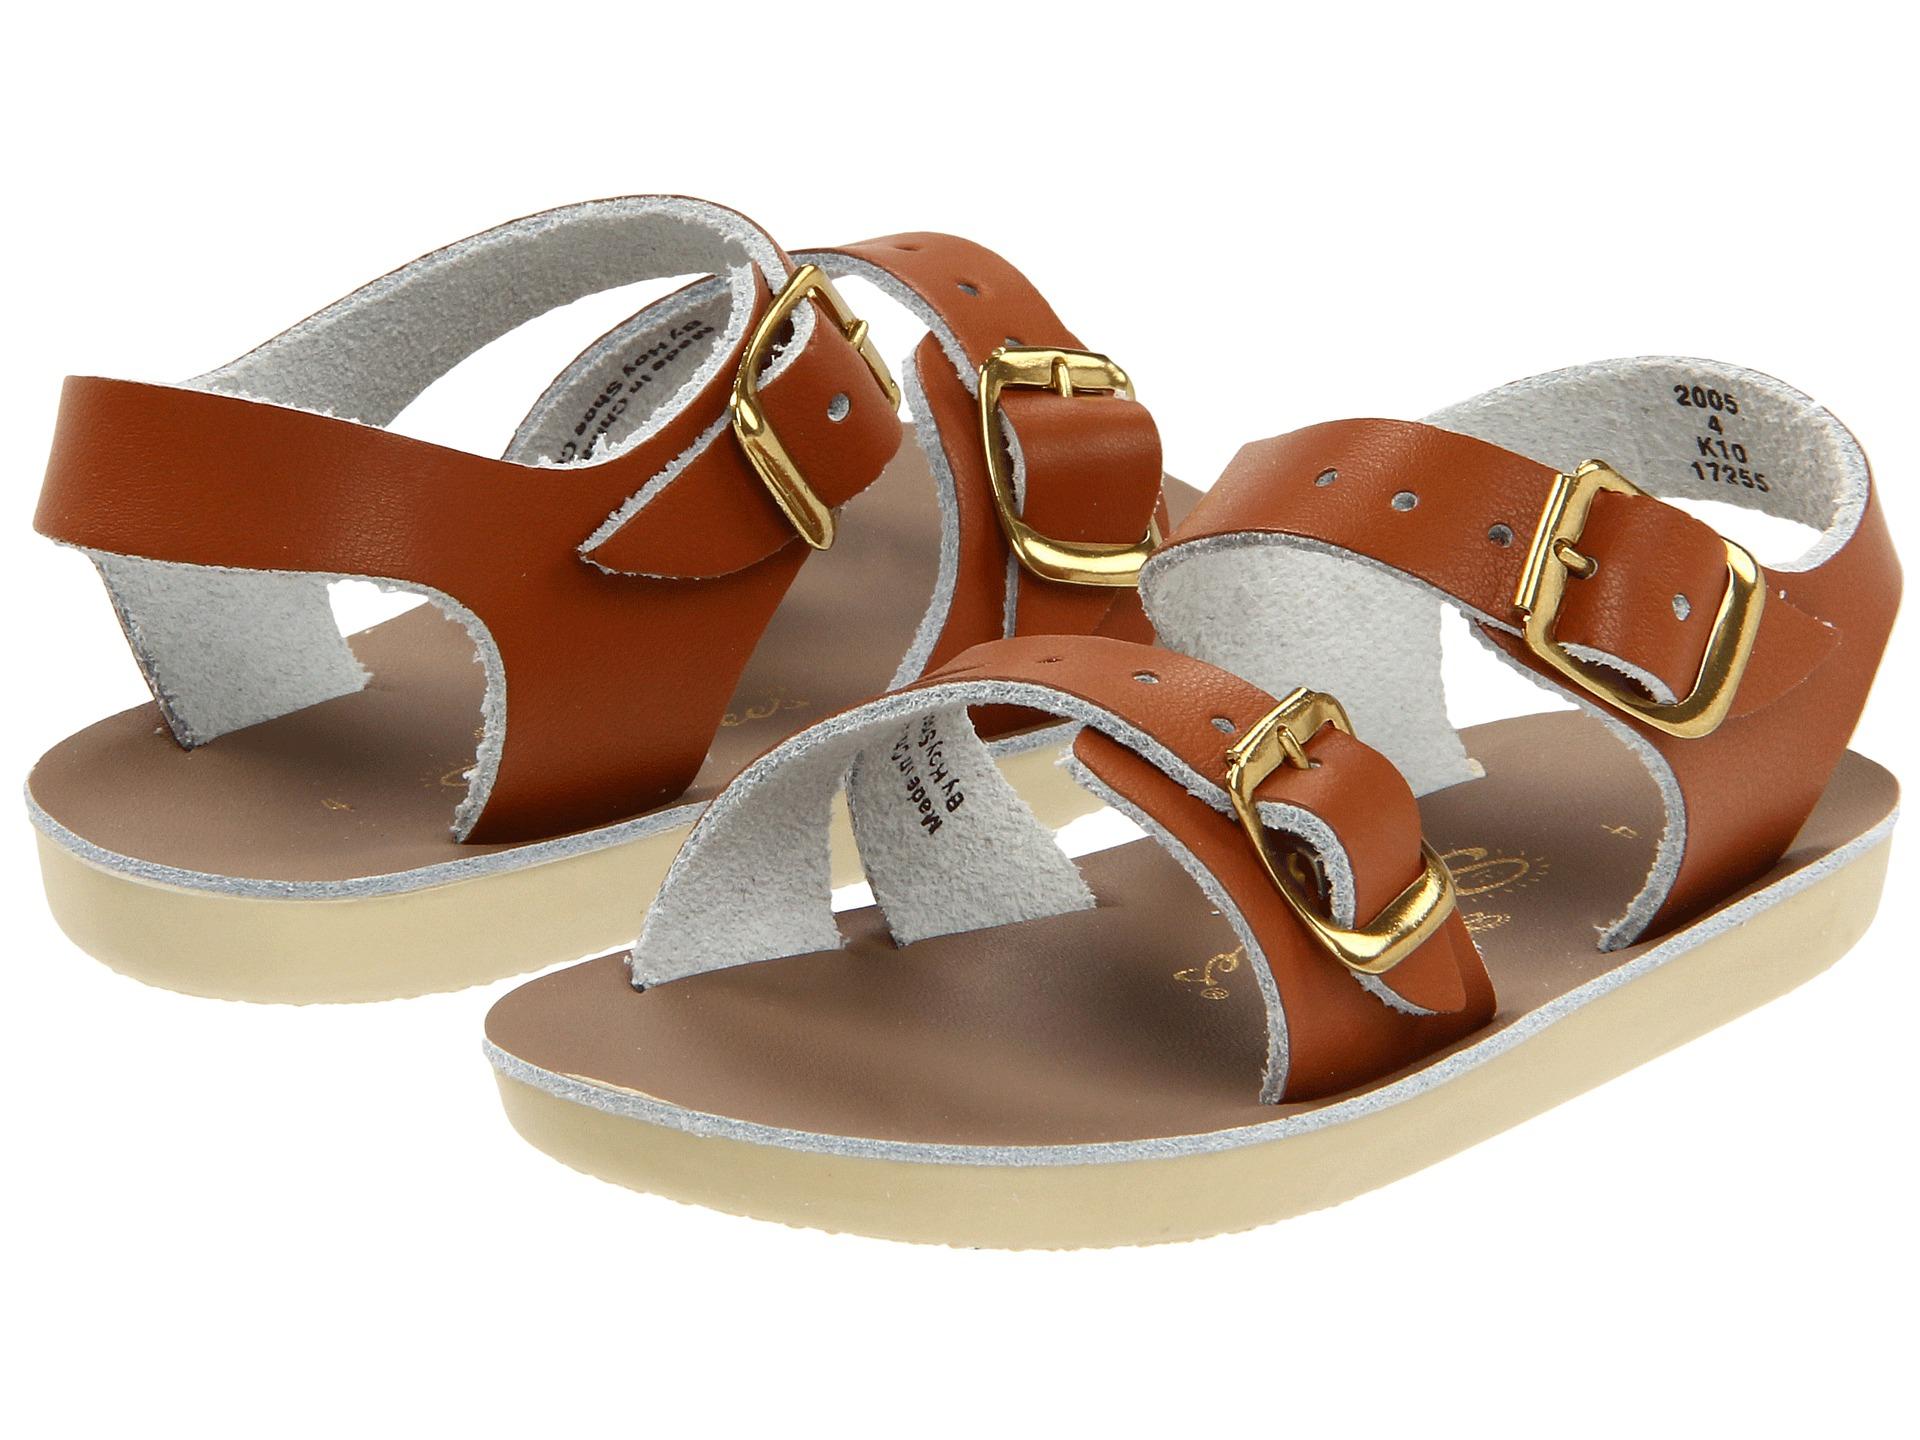 salt water sandal by hoy shoes sun san sea wees infant toddler tan free. Black Bedroom Furniture Sets. Home Design Ideas